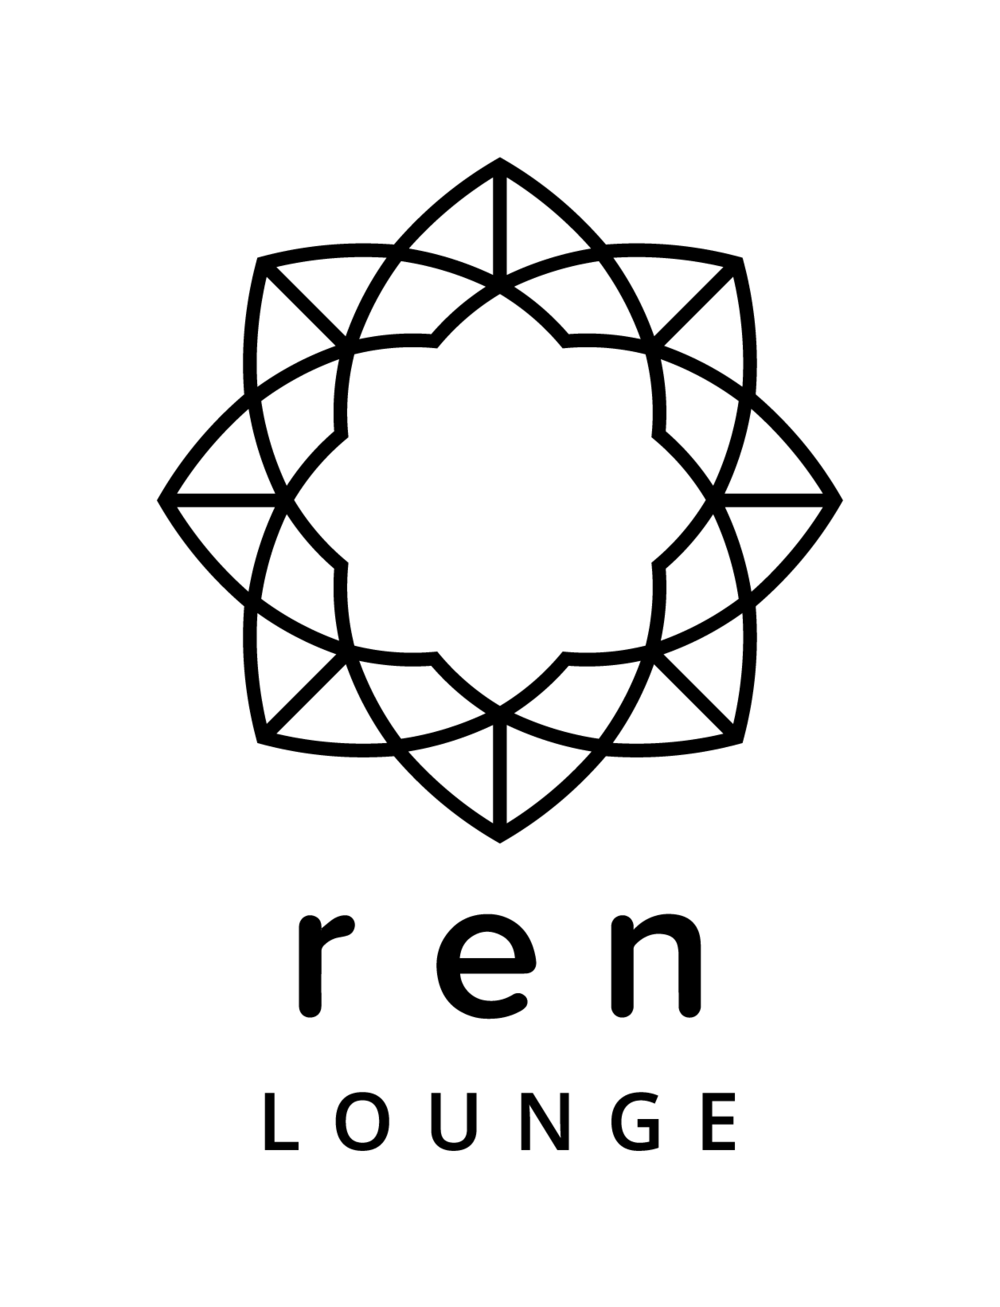 ren_logo-01.png